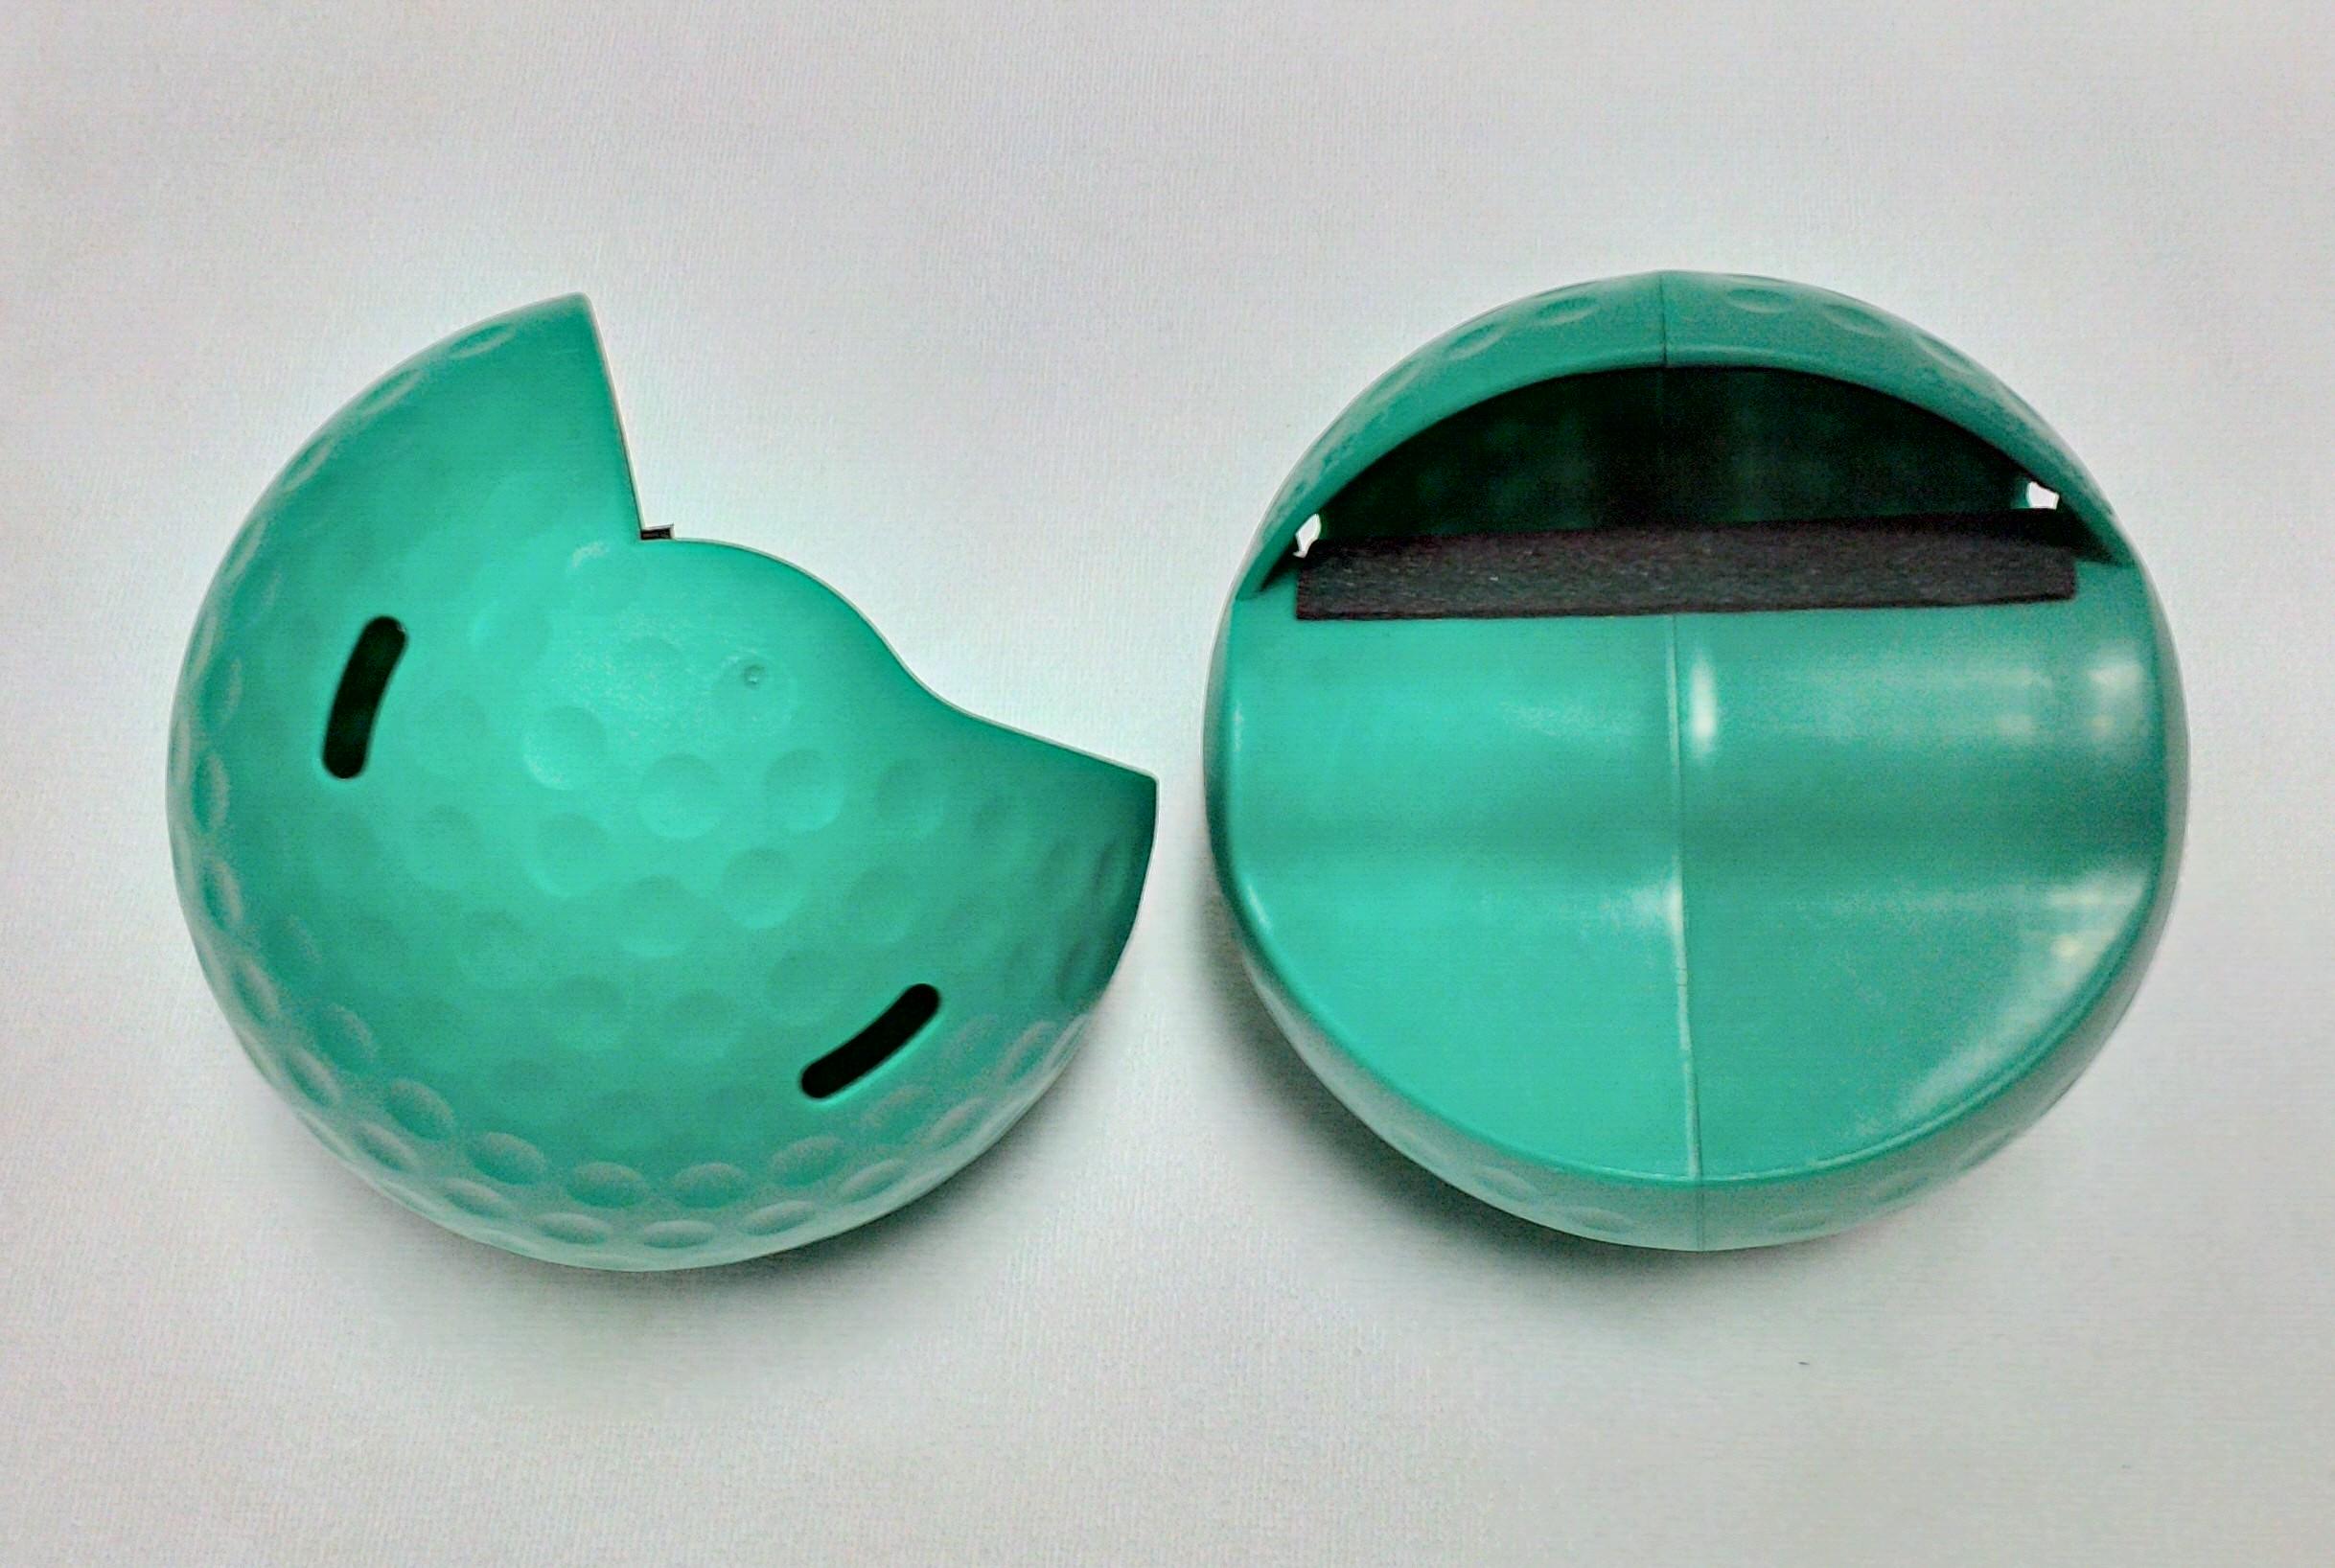 Greenbells pair